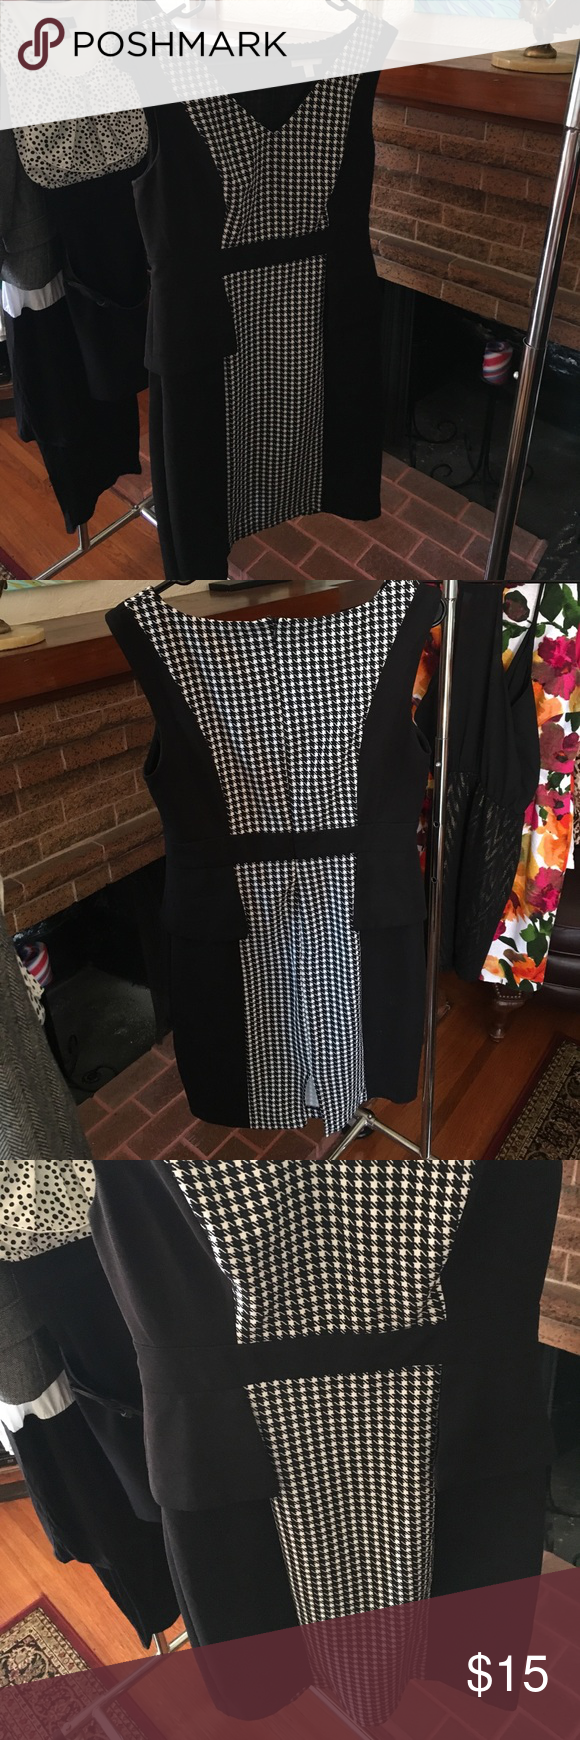 Peplum style dress Chevron pattern knee length with cute peplum detail at waist New York & Company Dresses Midi